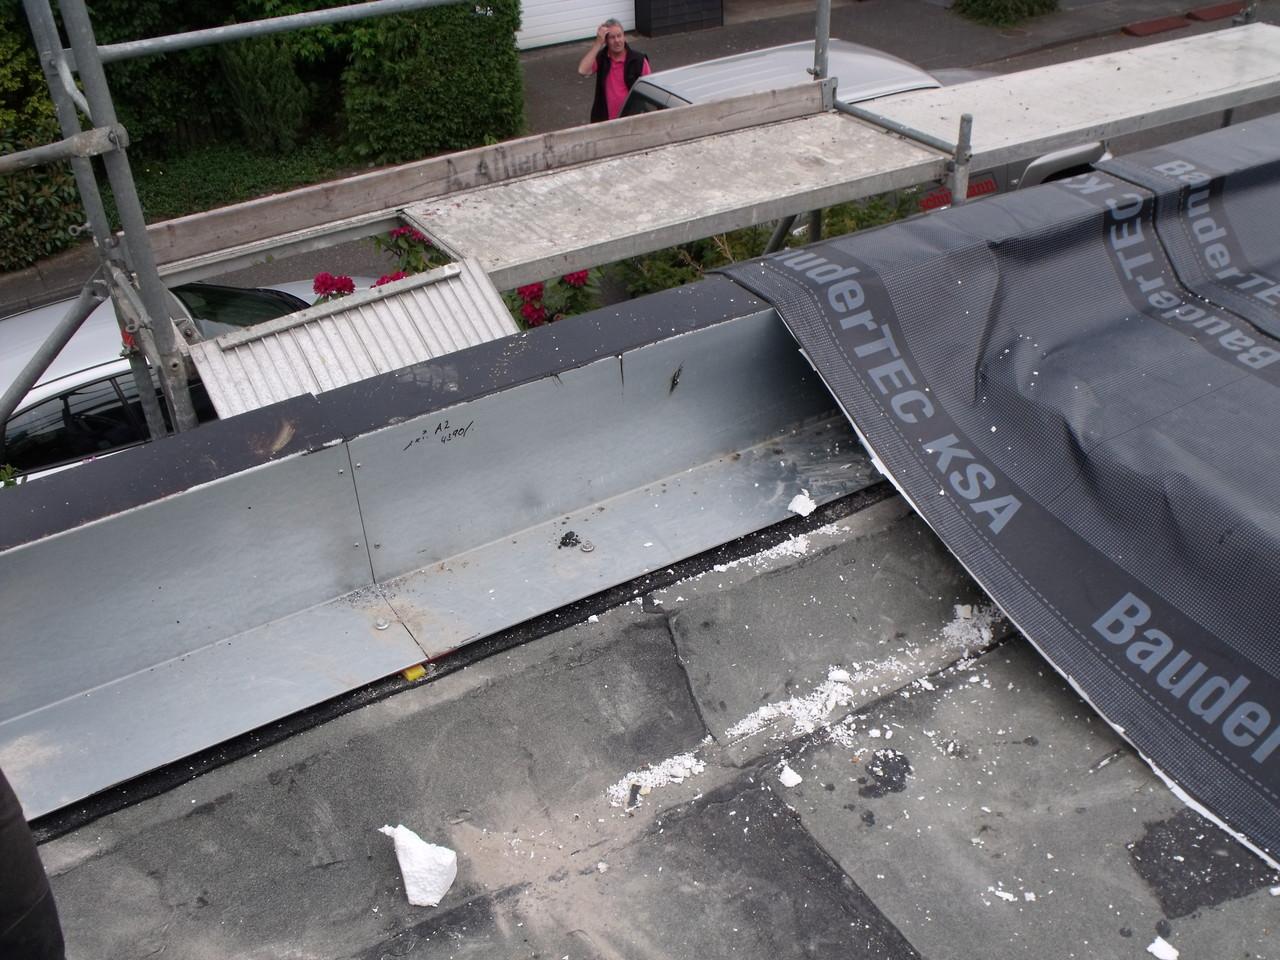 Profilblech zur Wärmebrücken reduzierten Flachdach-Wand-Anschluß